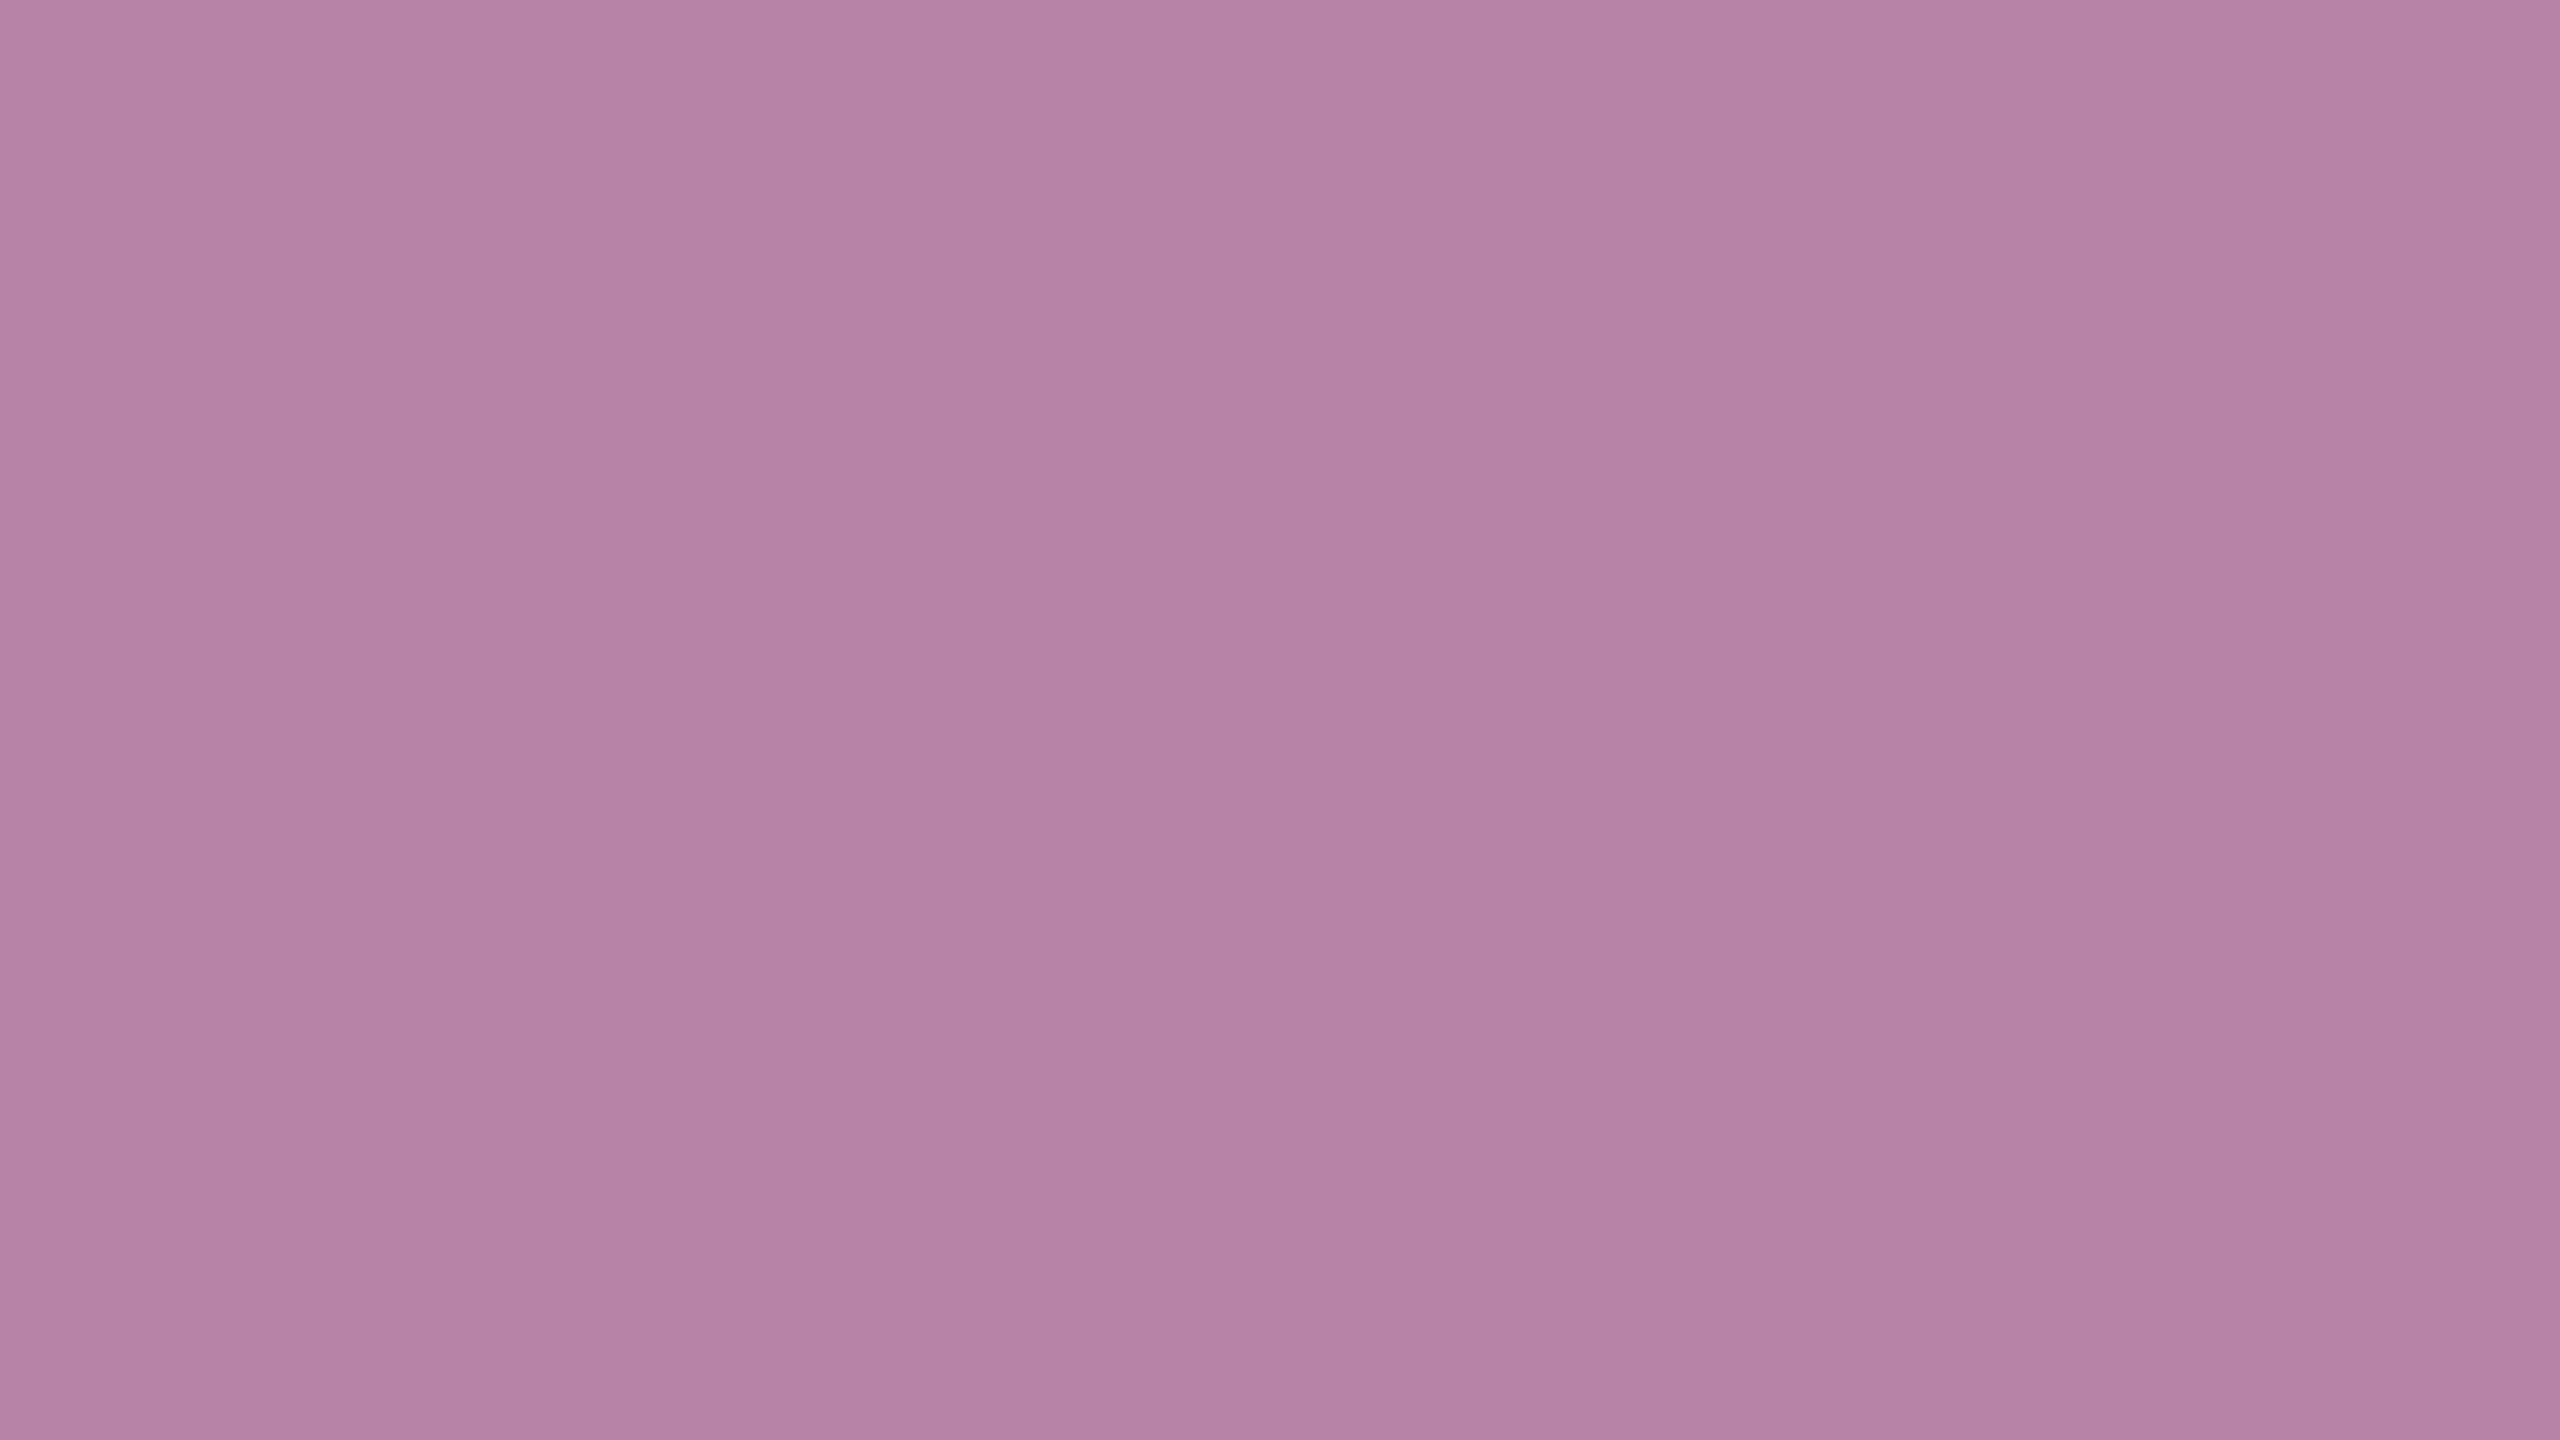 2560x1440 Opera Mauve Solid Color Background